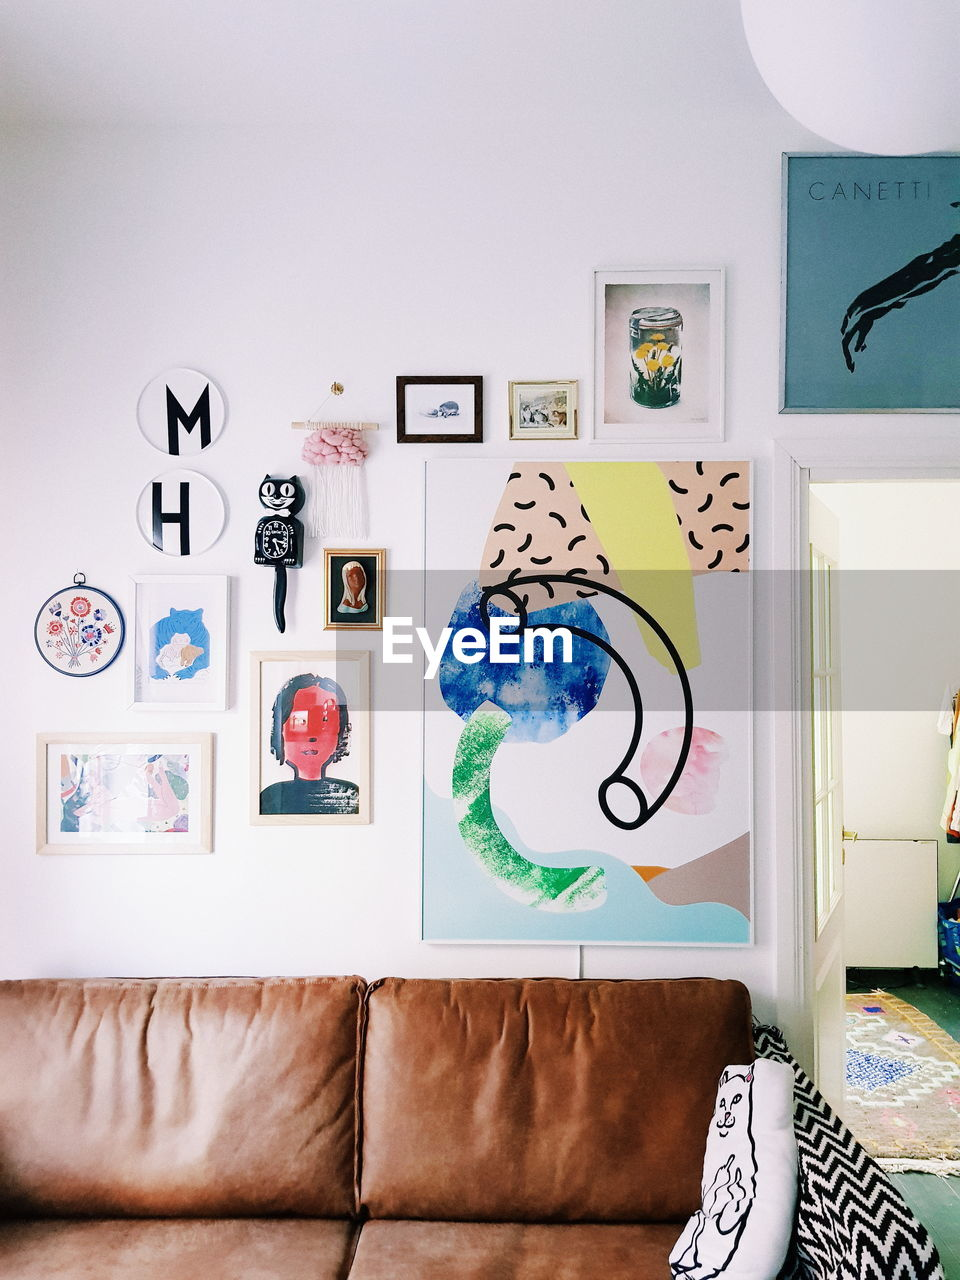 GRAFFITI ON WALL OF HOME